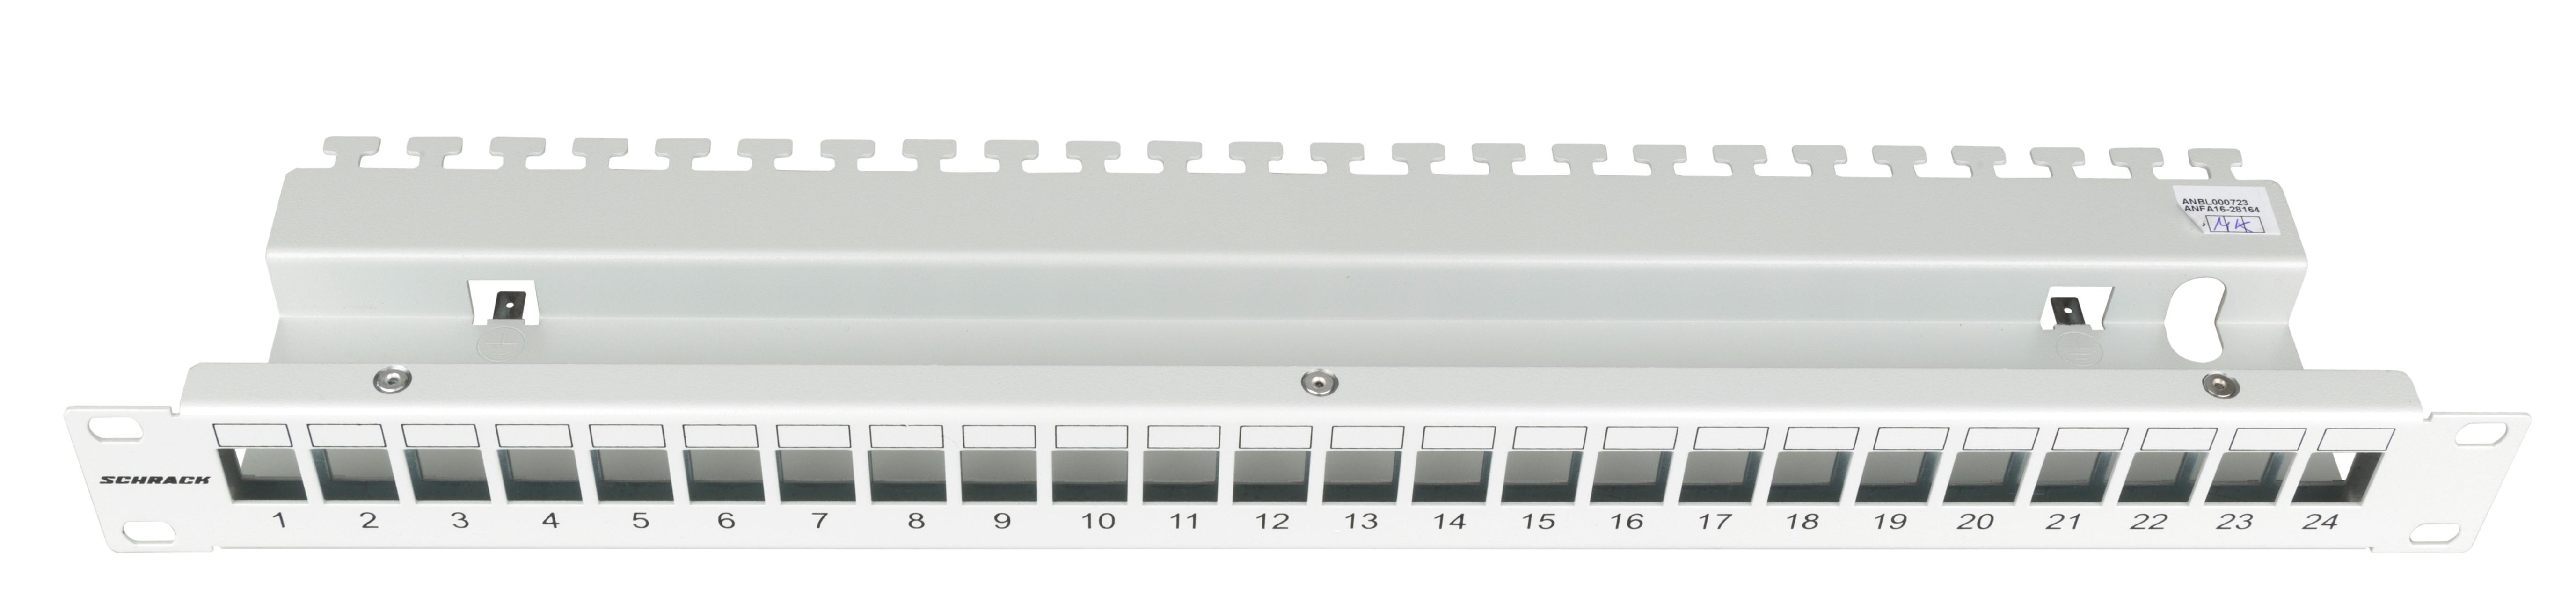 1 Stk Patchpanel 19 leer für 24 Module (SFA)(SFB), 1HE, RAL7035 HSER0240GV